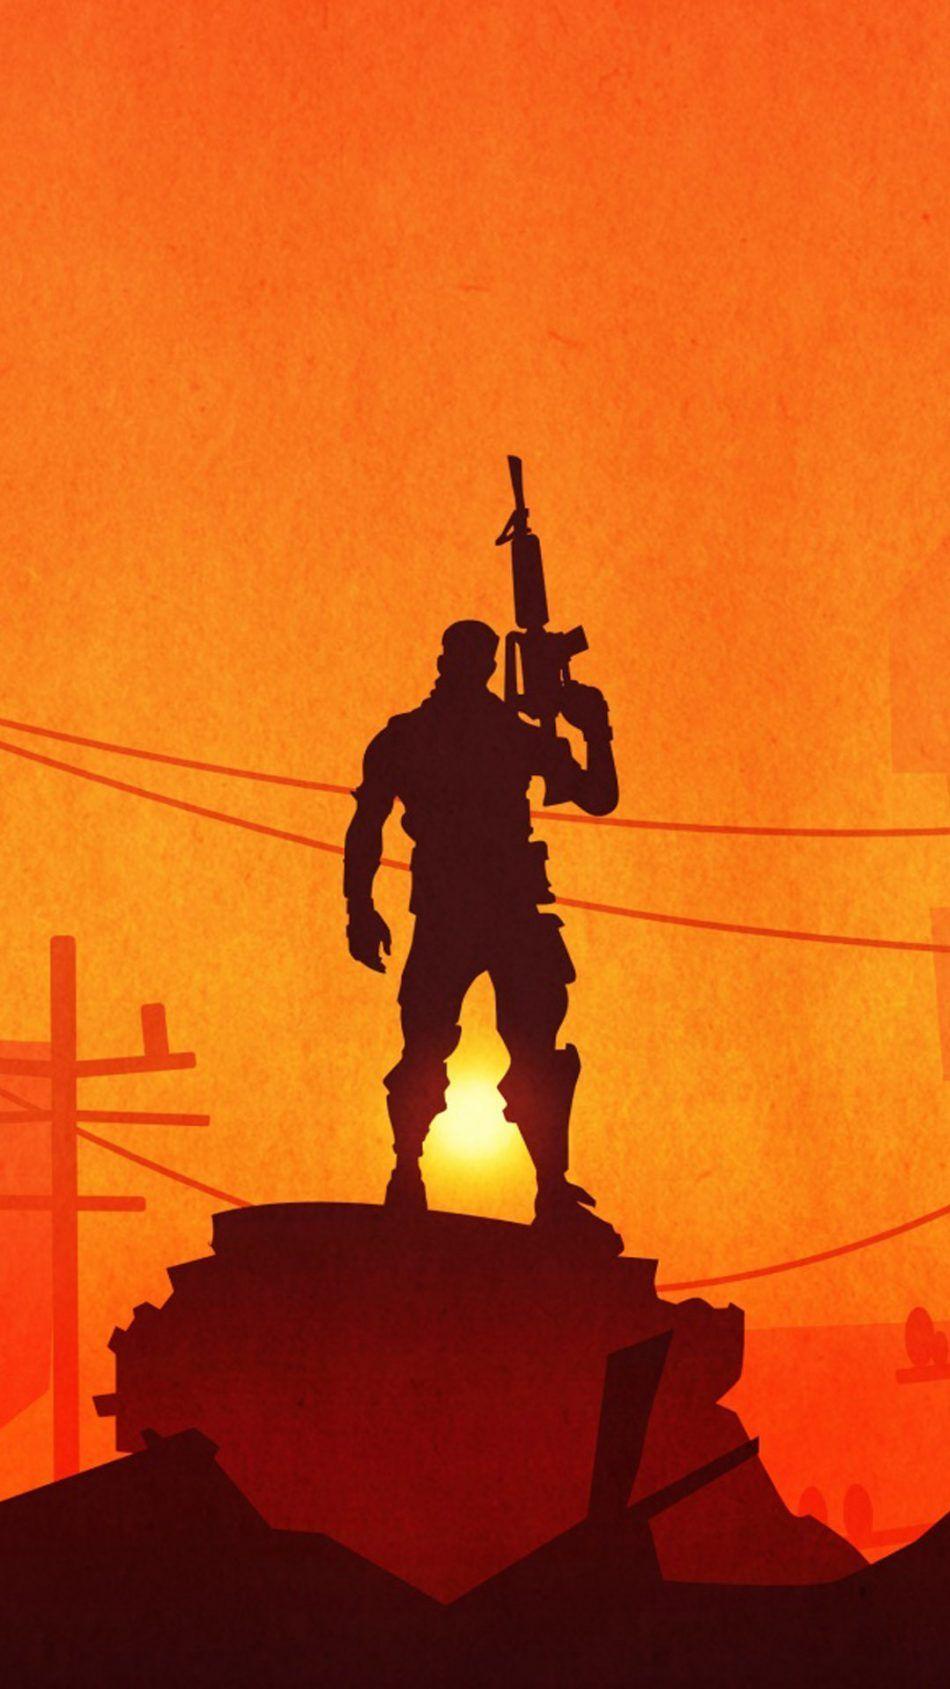 Lone Survivor Fortnite Battle Royale Hd Mobile Wallpaper Fortnite Mobile Wallpaper Phone Wallpaper Best Gaming Wallpapers